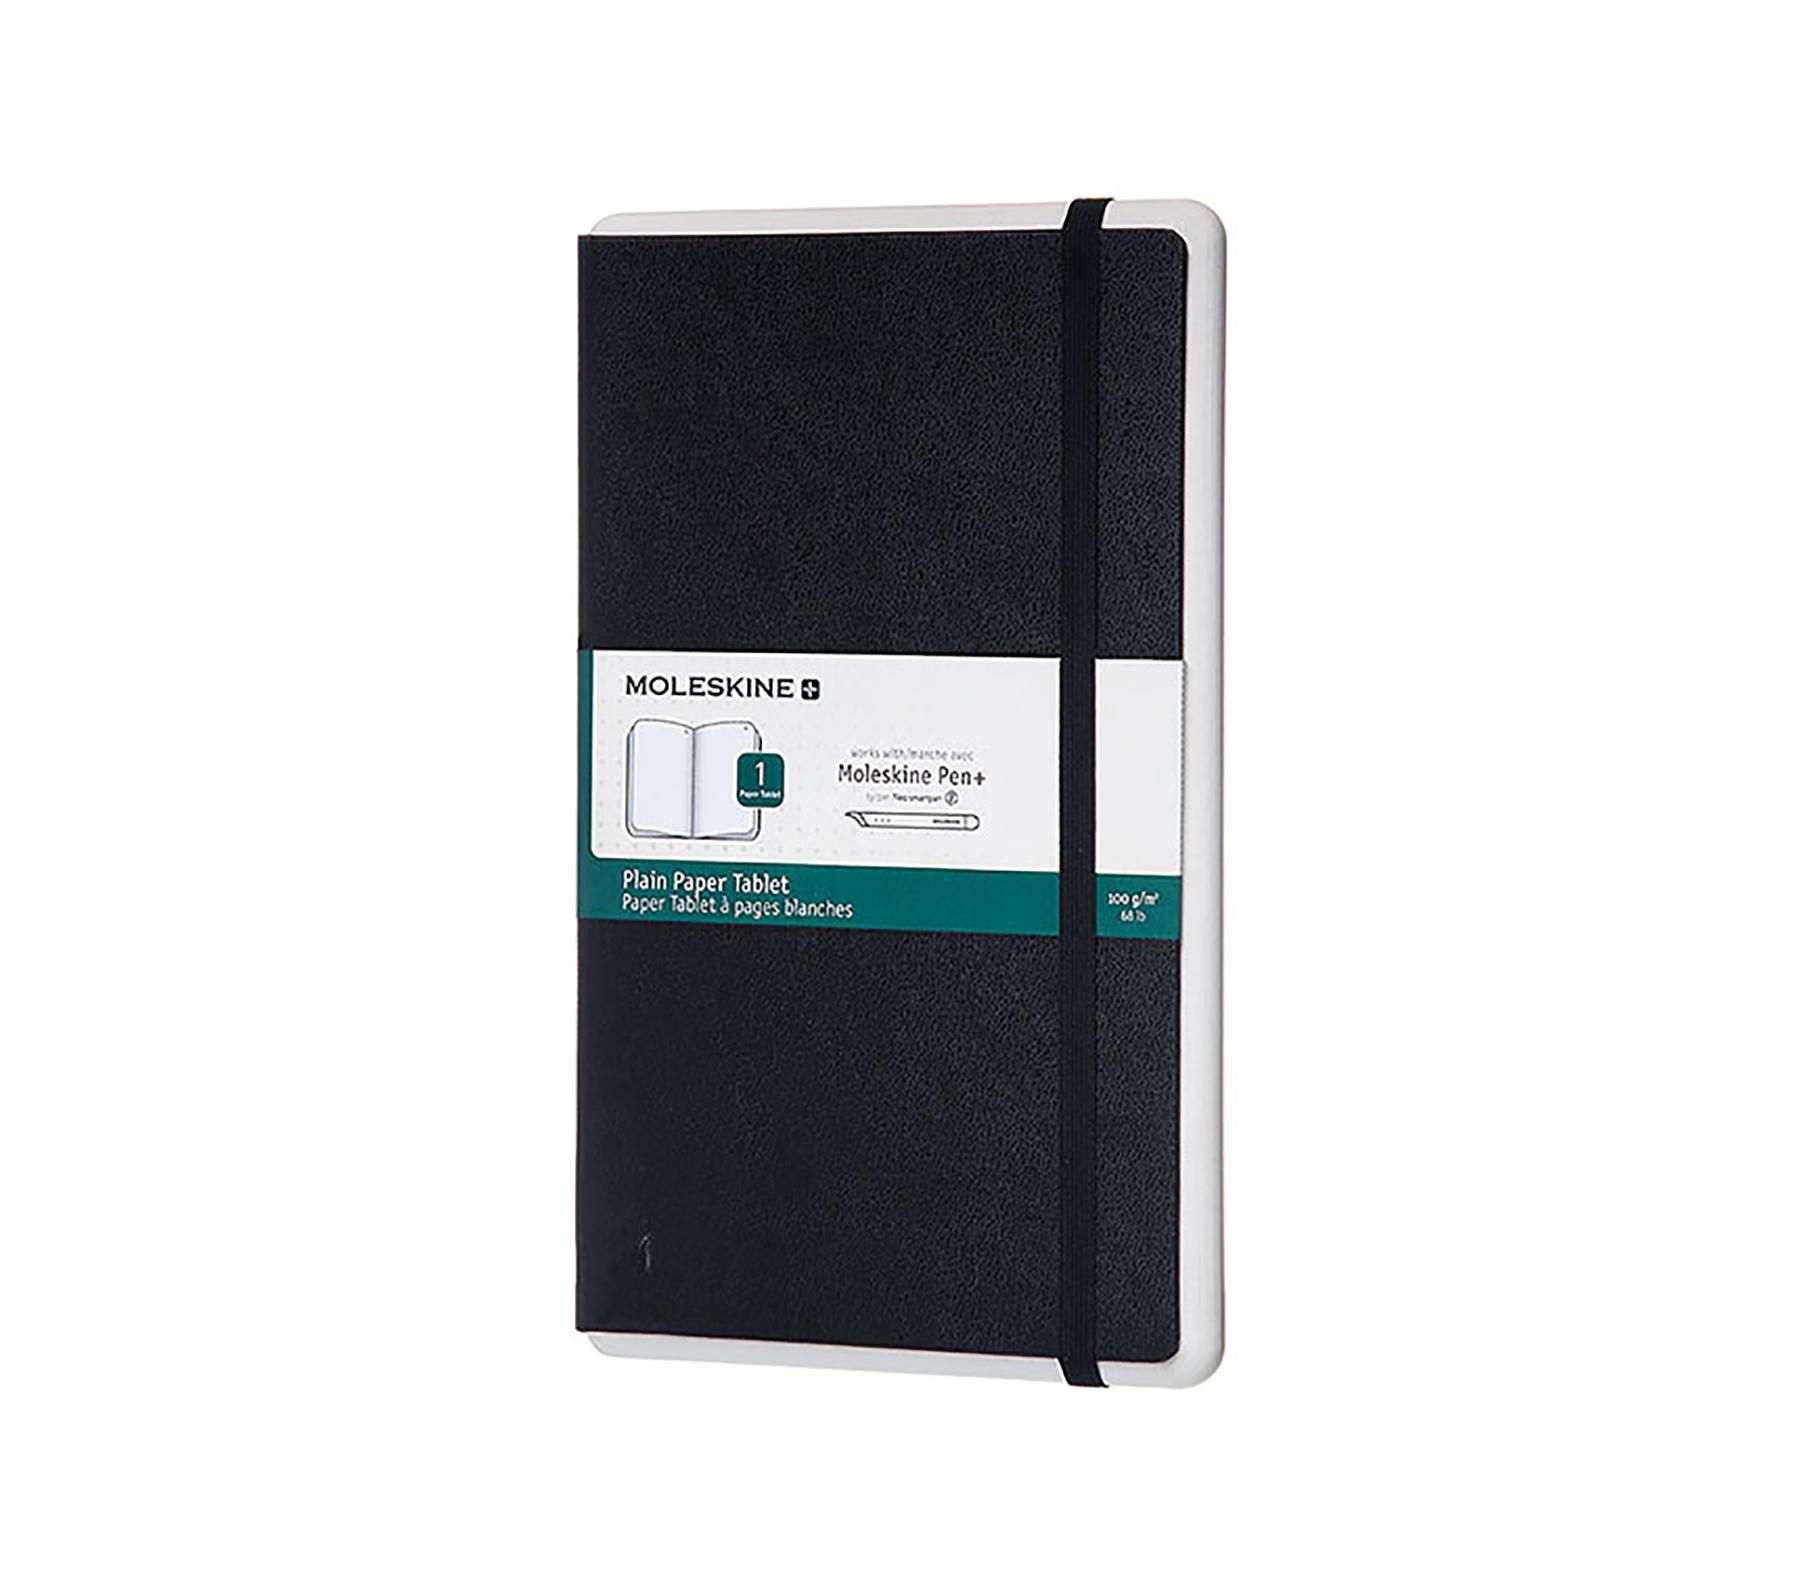 Moleskine PTNL33HBK01 writing notebook Black